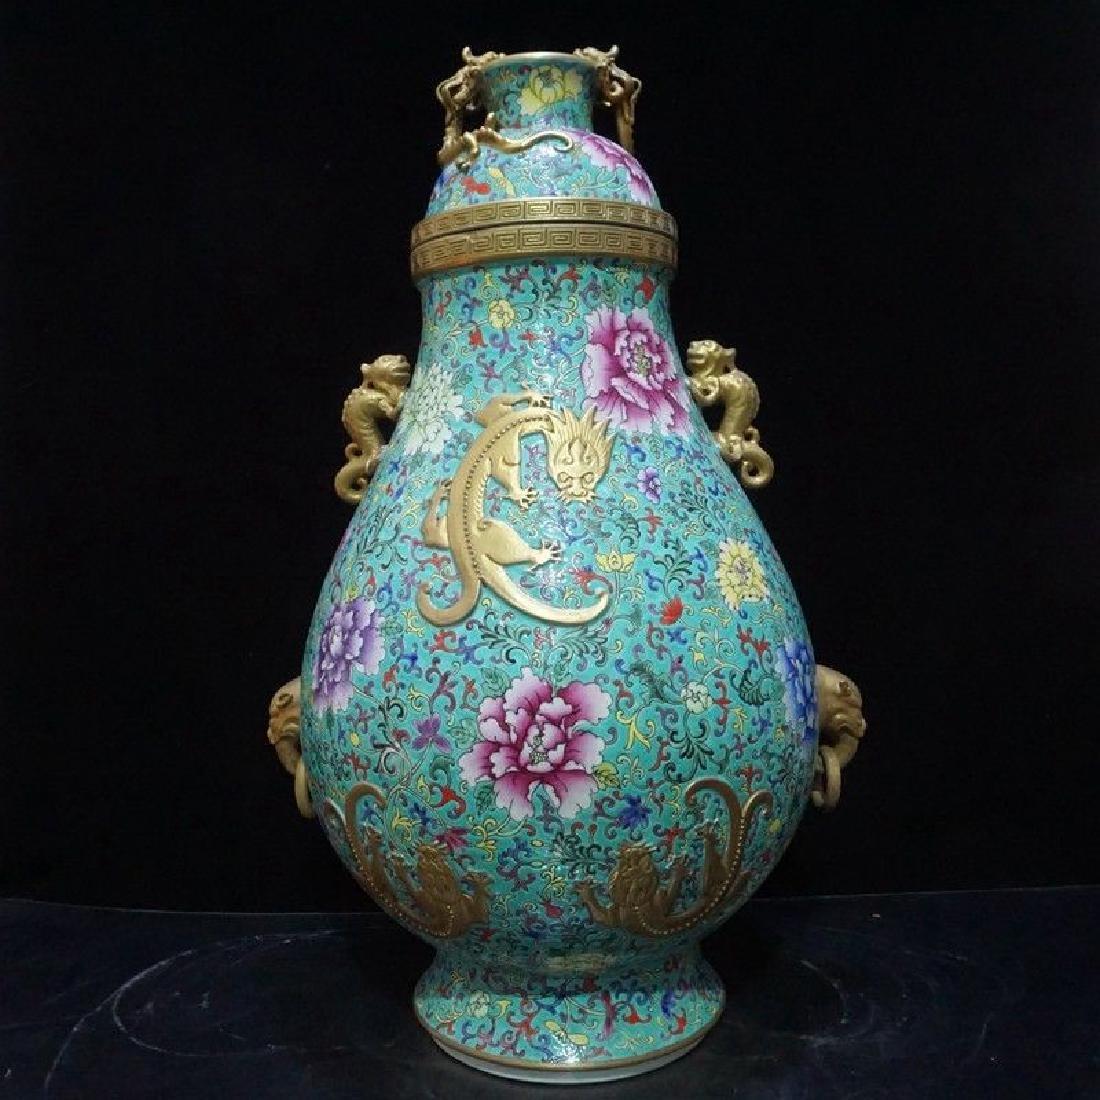 A Famille Rose and Gilt Decorated Porcelain Vase